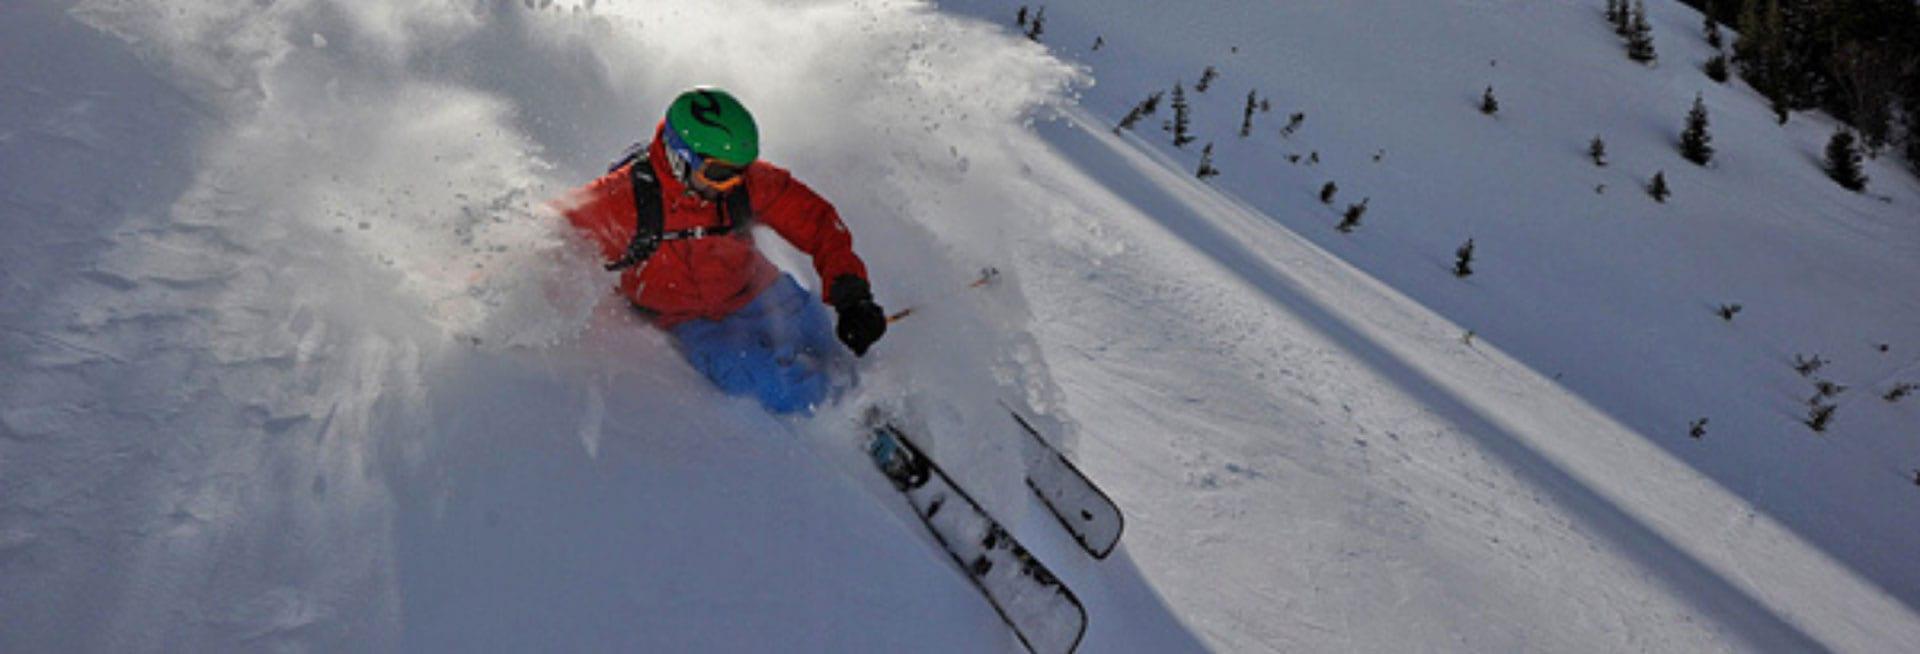 Skier going downhill.